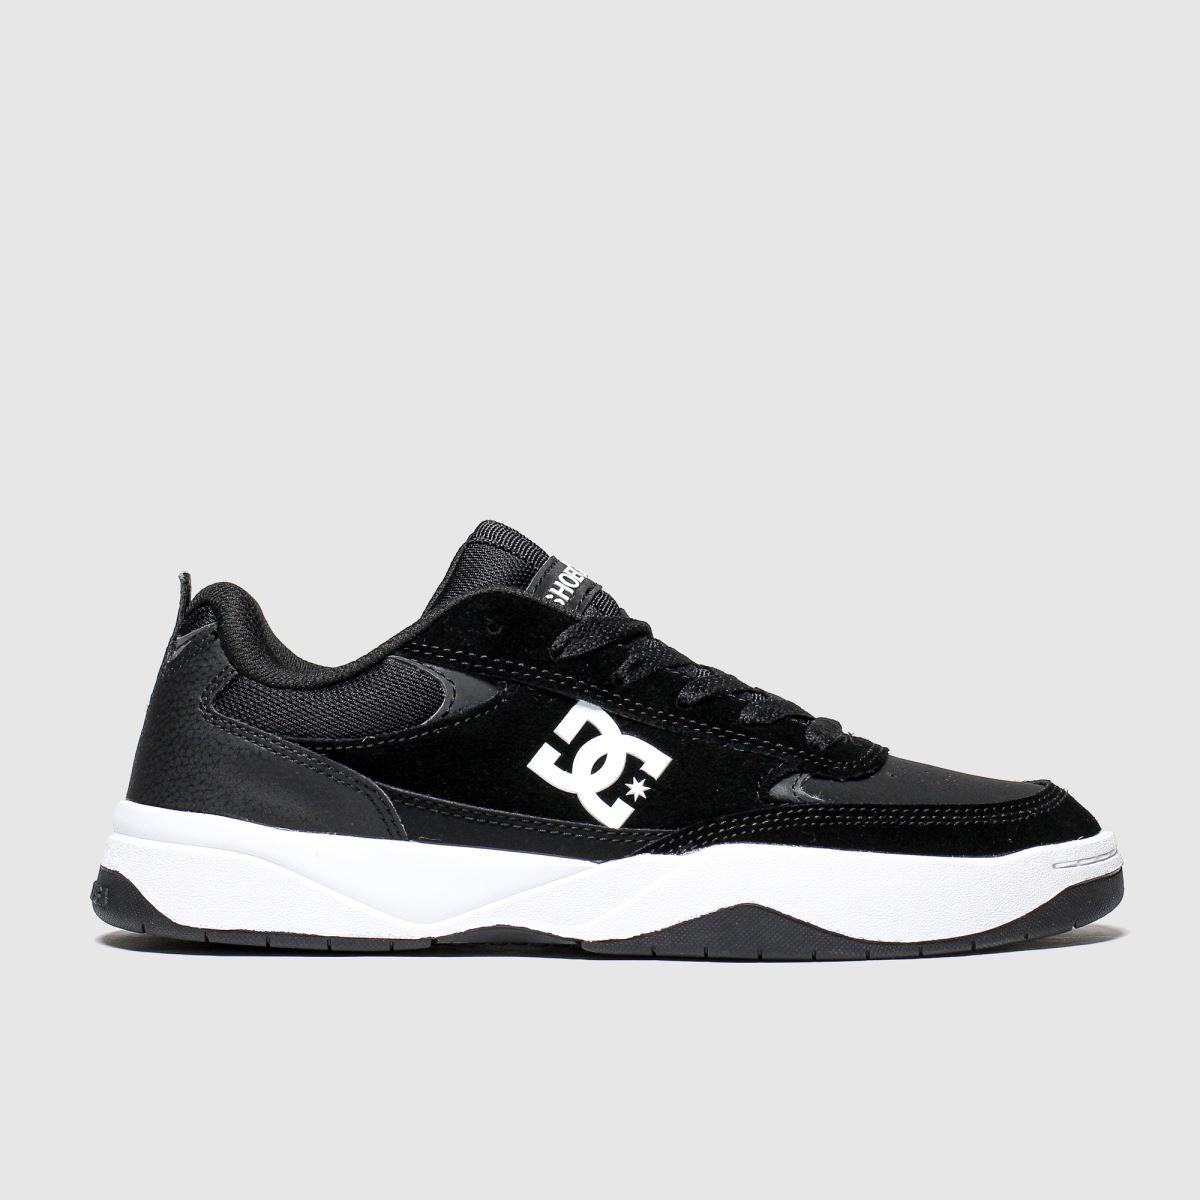 dc shoes Dc Shoes Black & White Penza Trainers